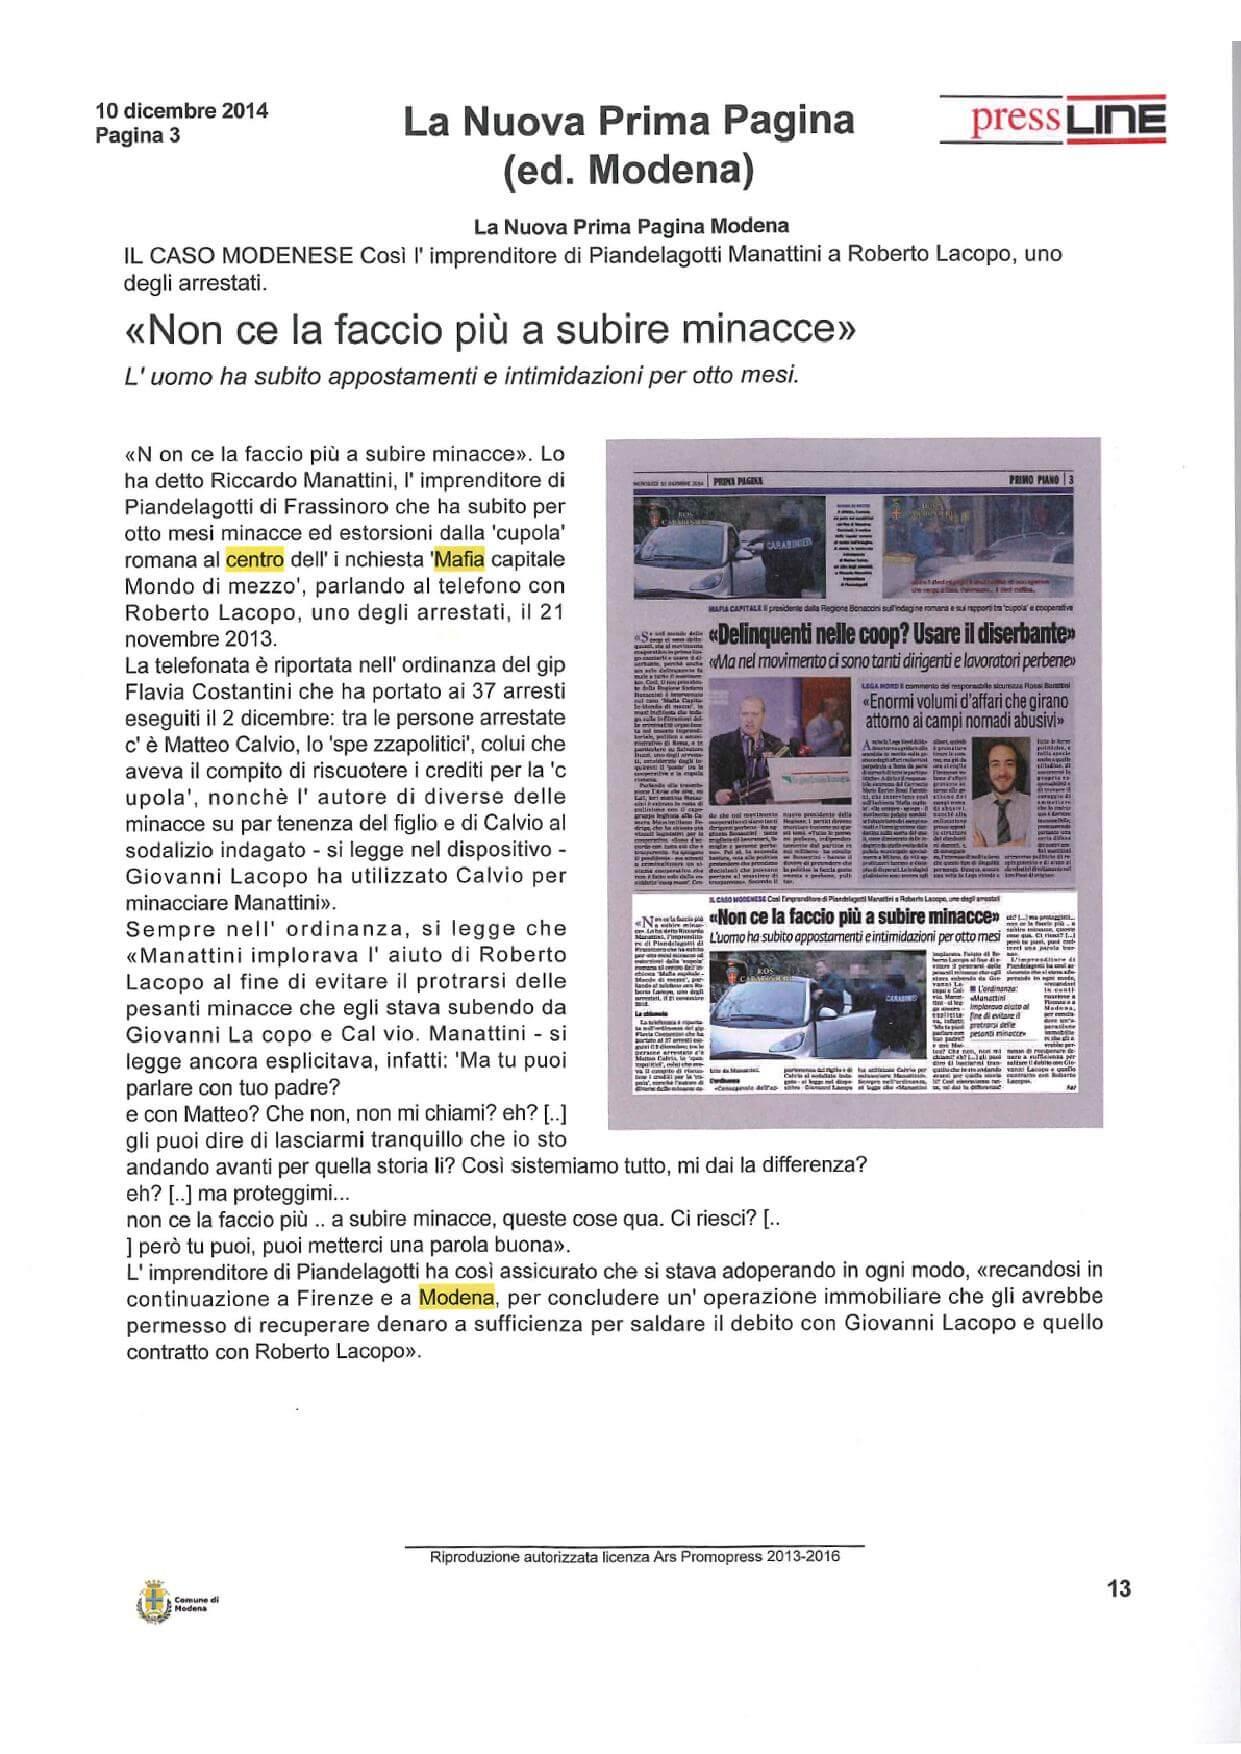 10_12_14_npp_p3_minacce-page-001